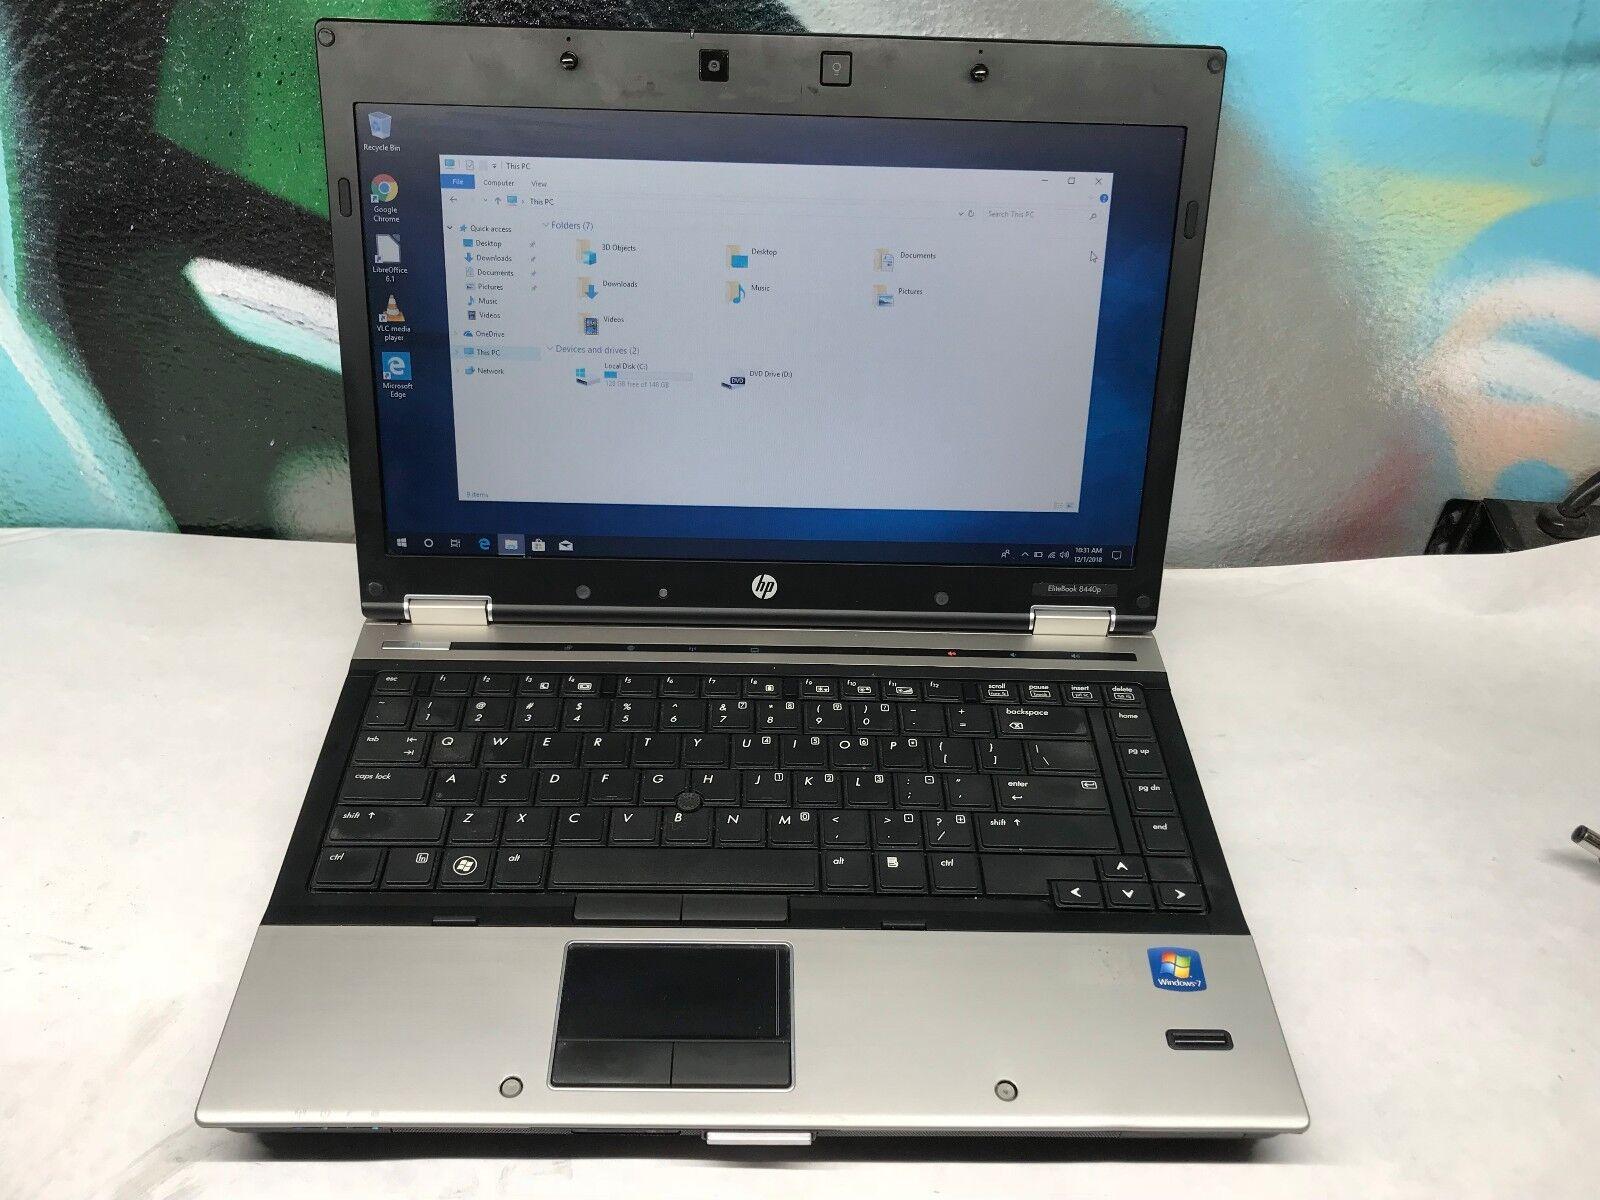 HP EliteBook 8440p Laptop / i5 2.4GHZ /  4GB DDR3 / 160GB Windows 10 COMPLETE